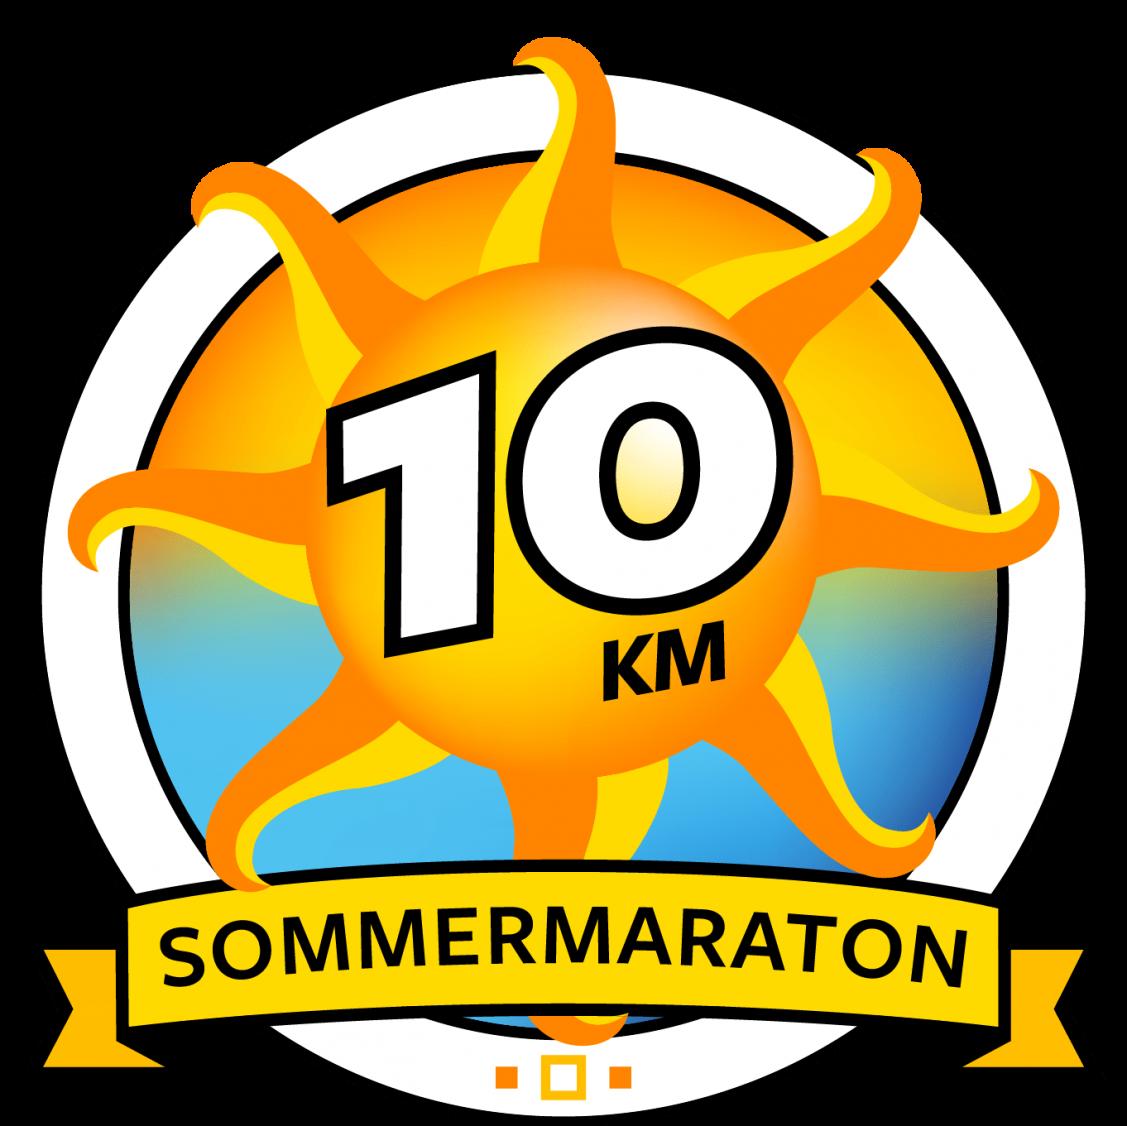 Sommermaraton 10 km